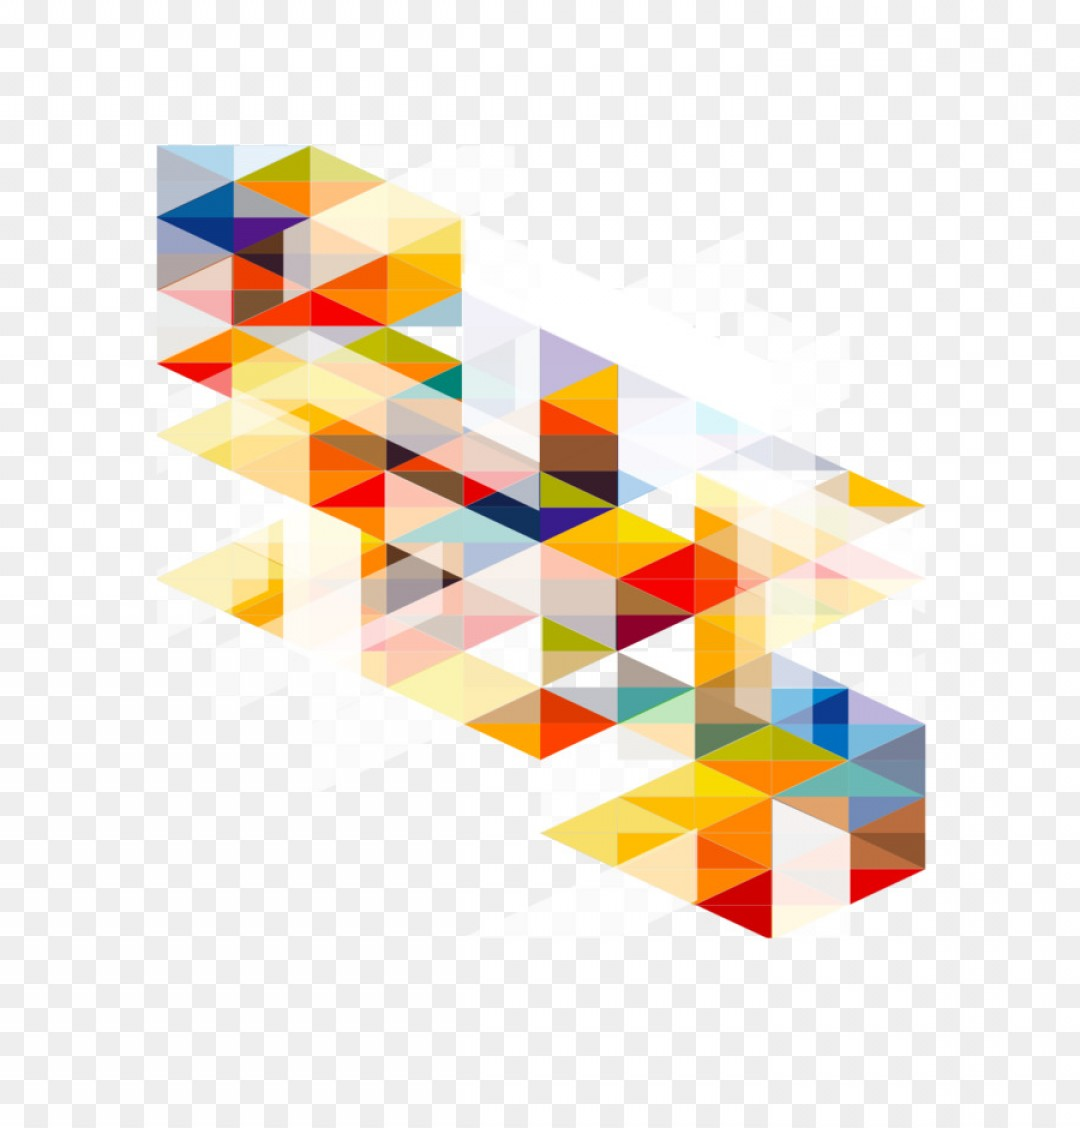 Png Adobe Illustrator Template Colorful Geometric Fash.